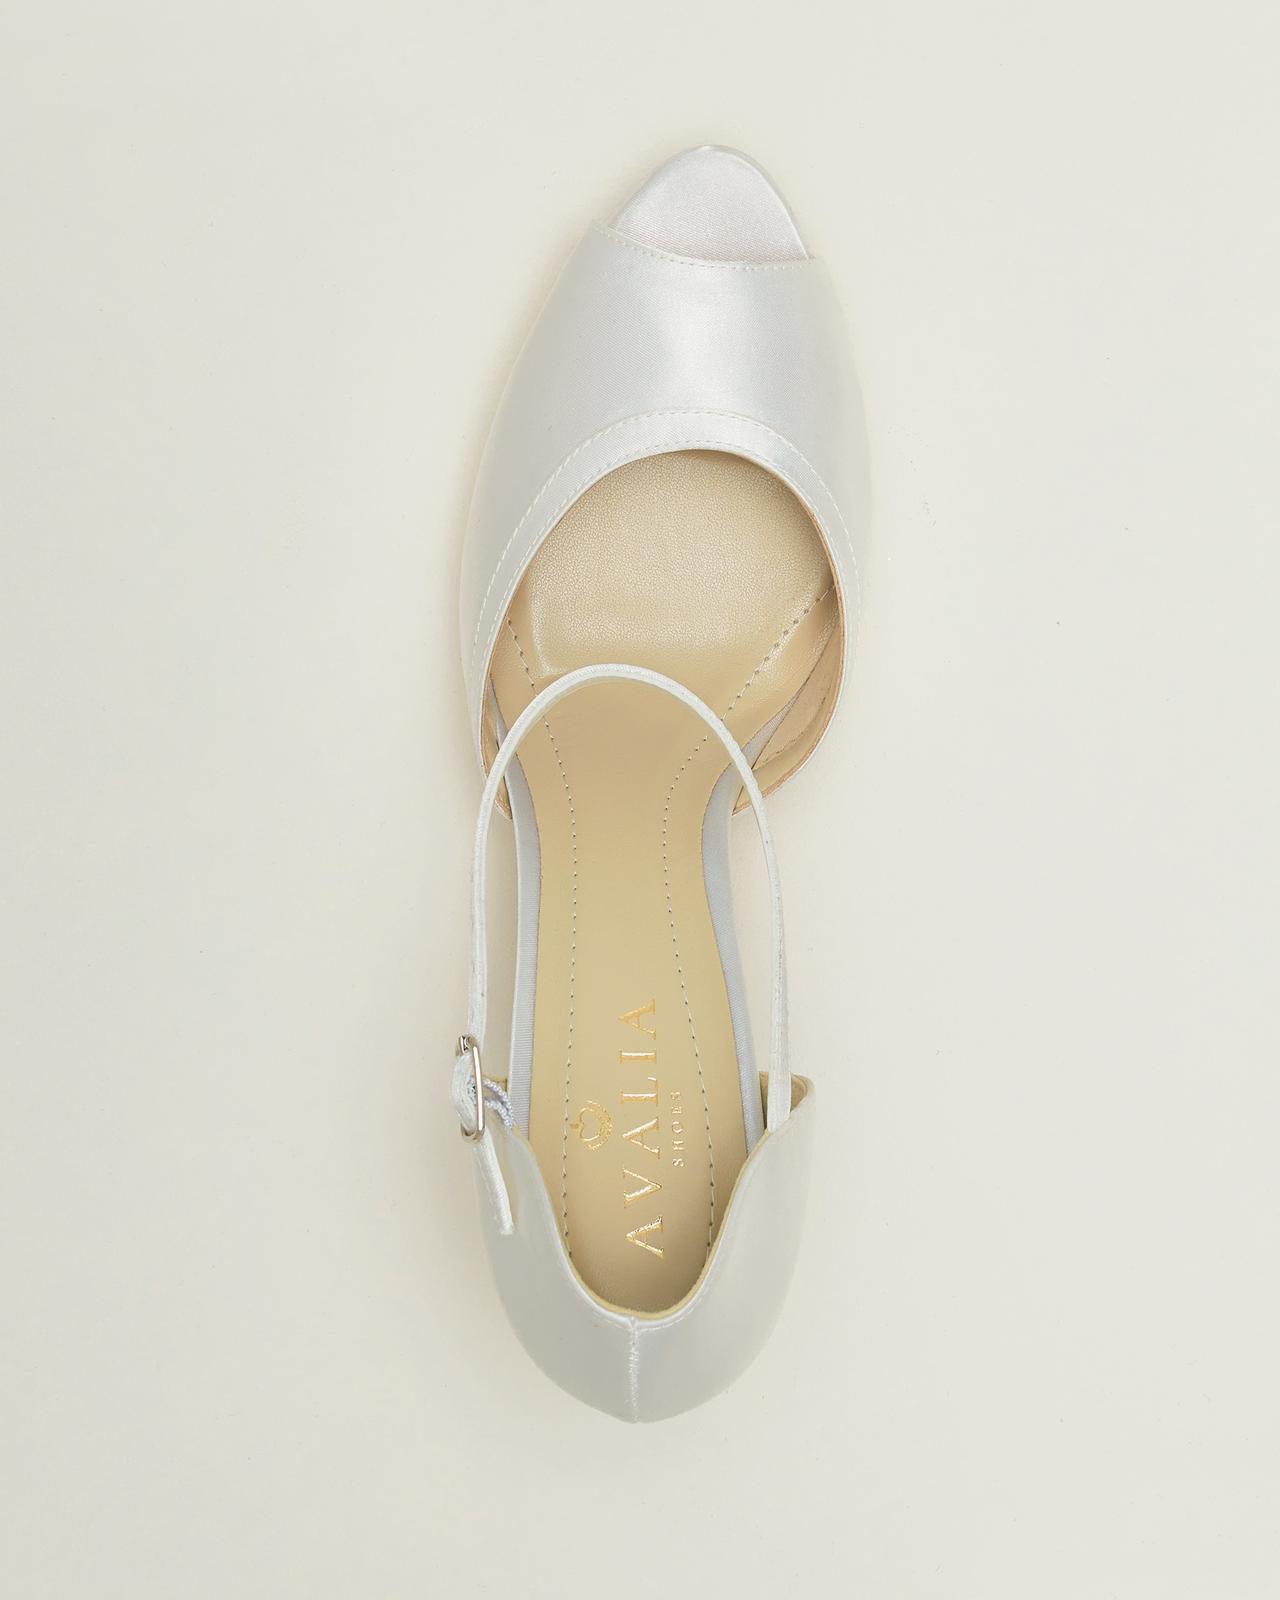 Svadobné topánky Ines - Obrázok č. 3